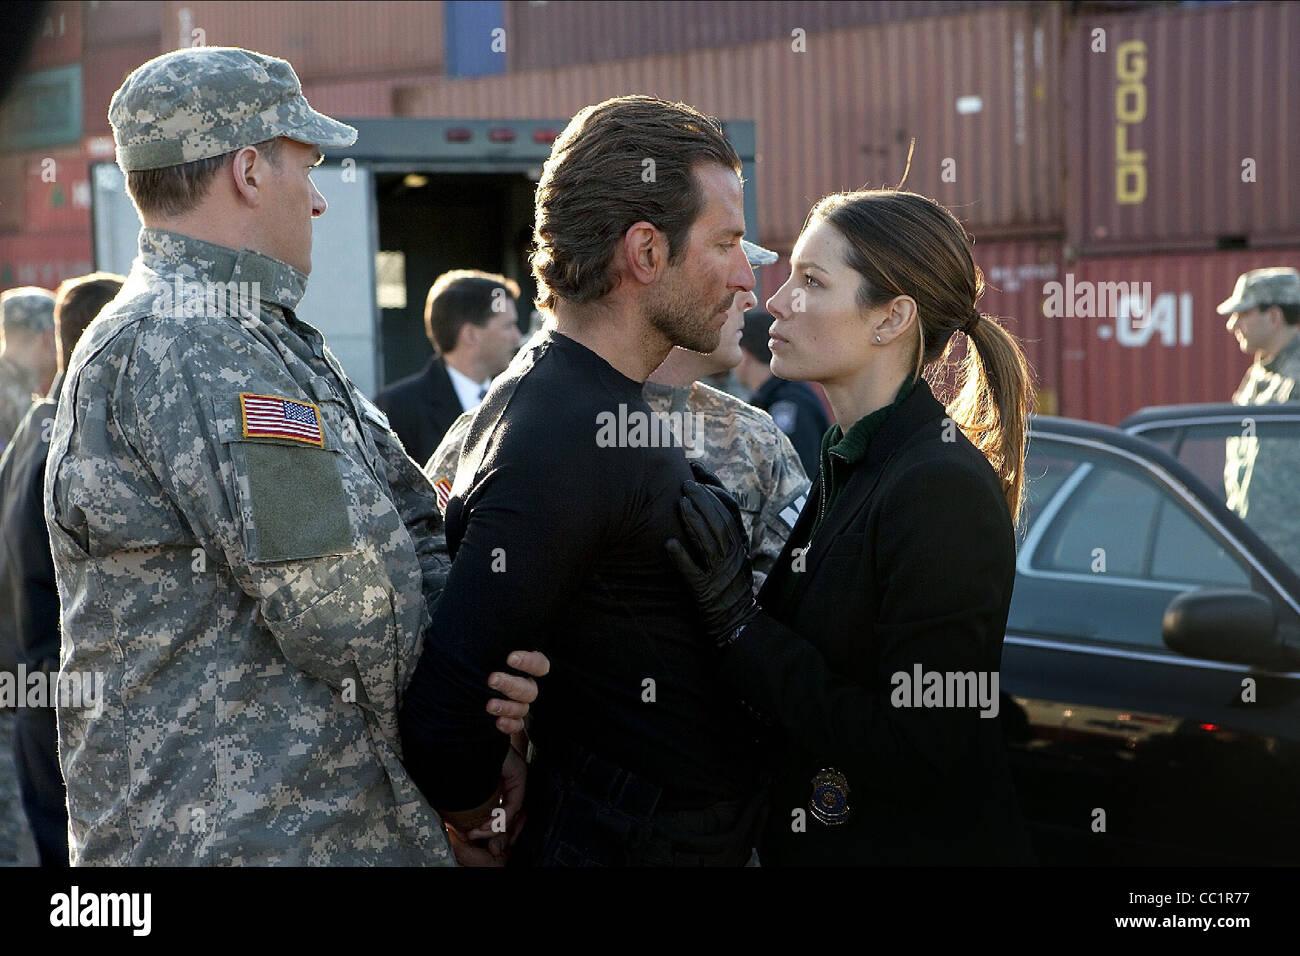 Bradley Cooper Jessica Biel The A Team 2010 Stock Photo Alamy